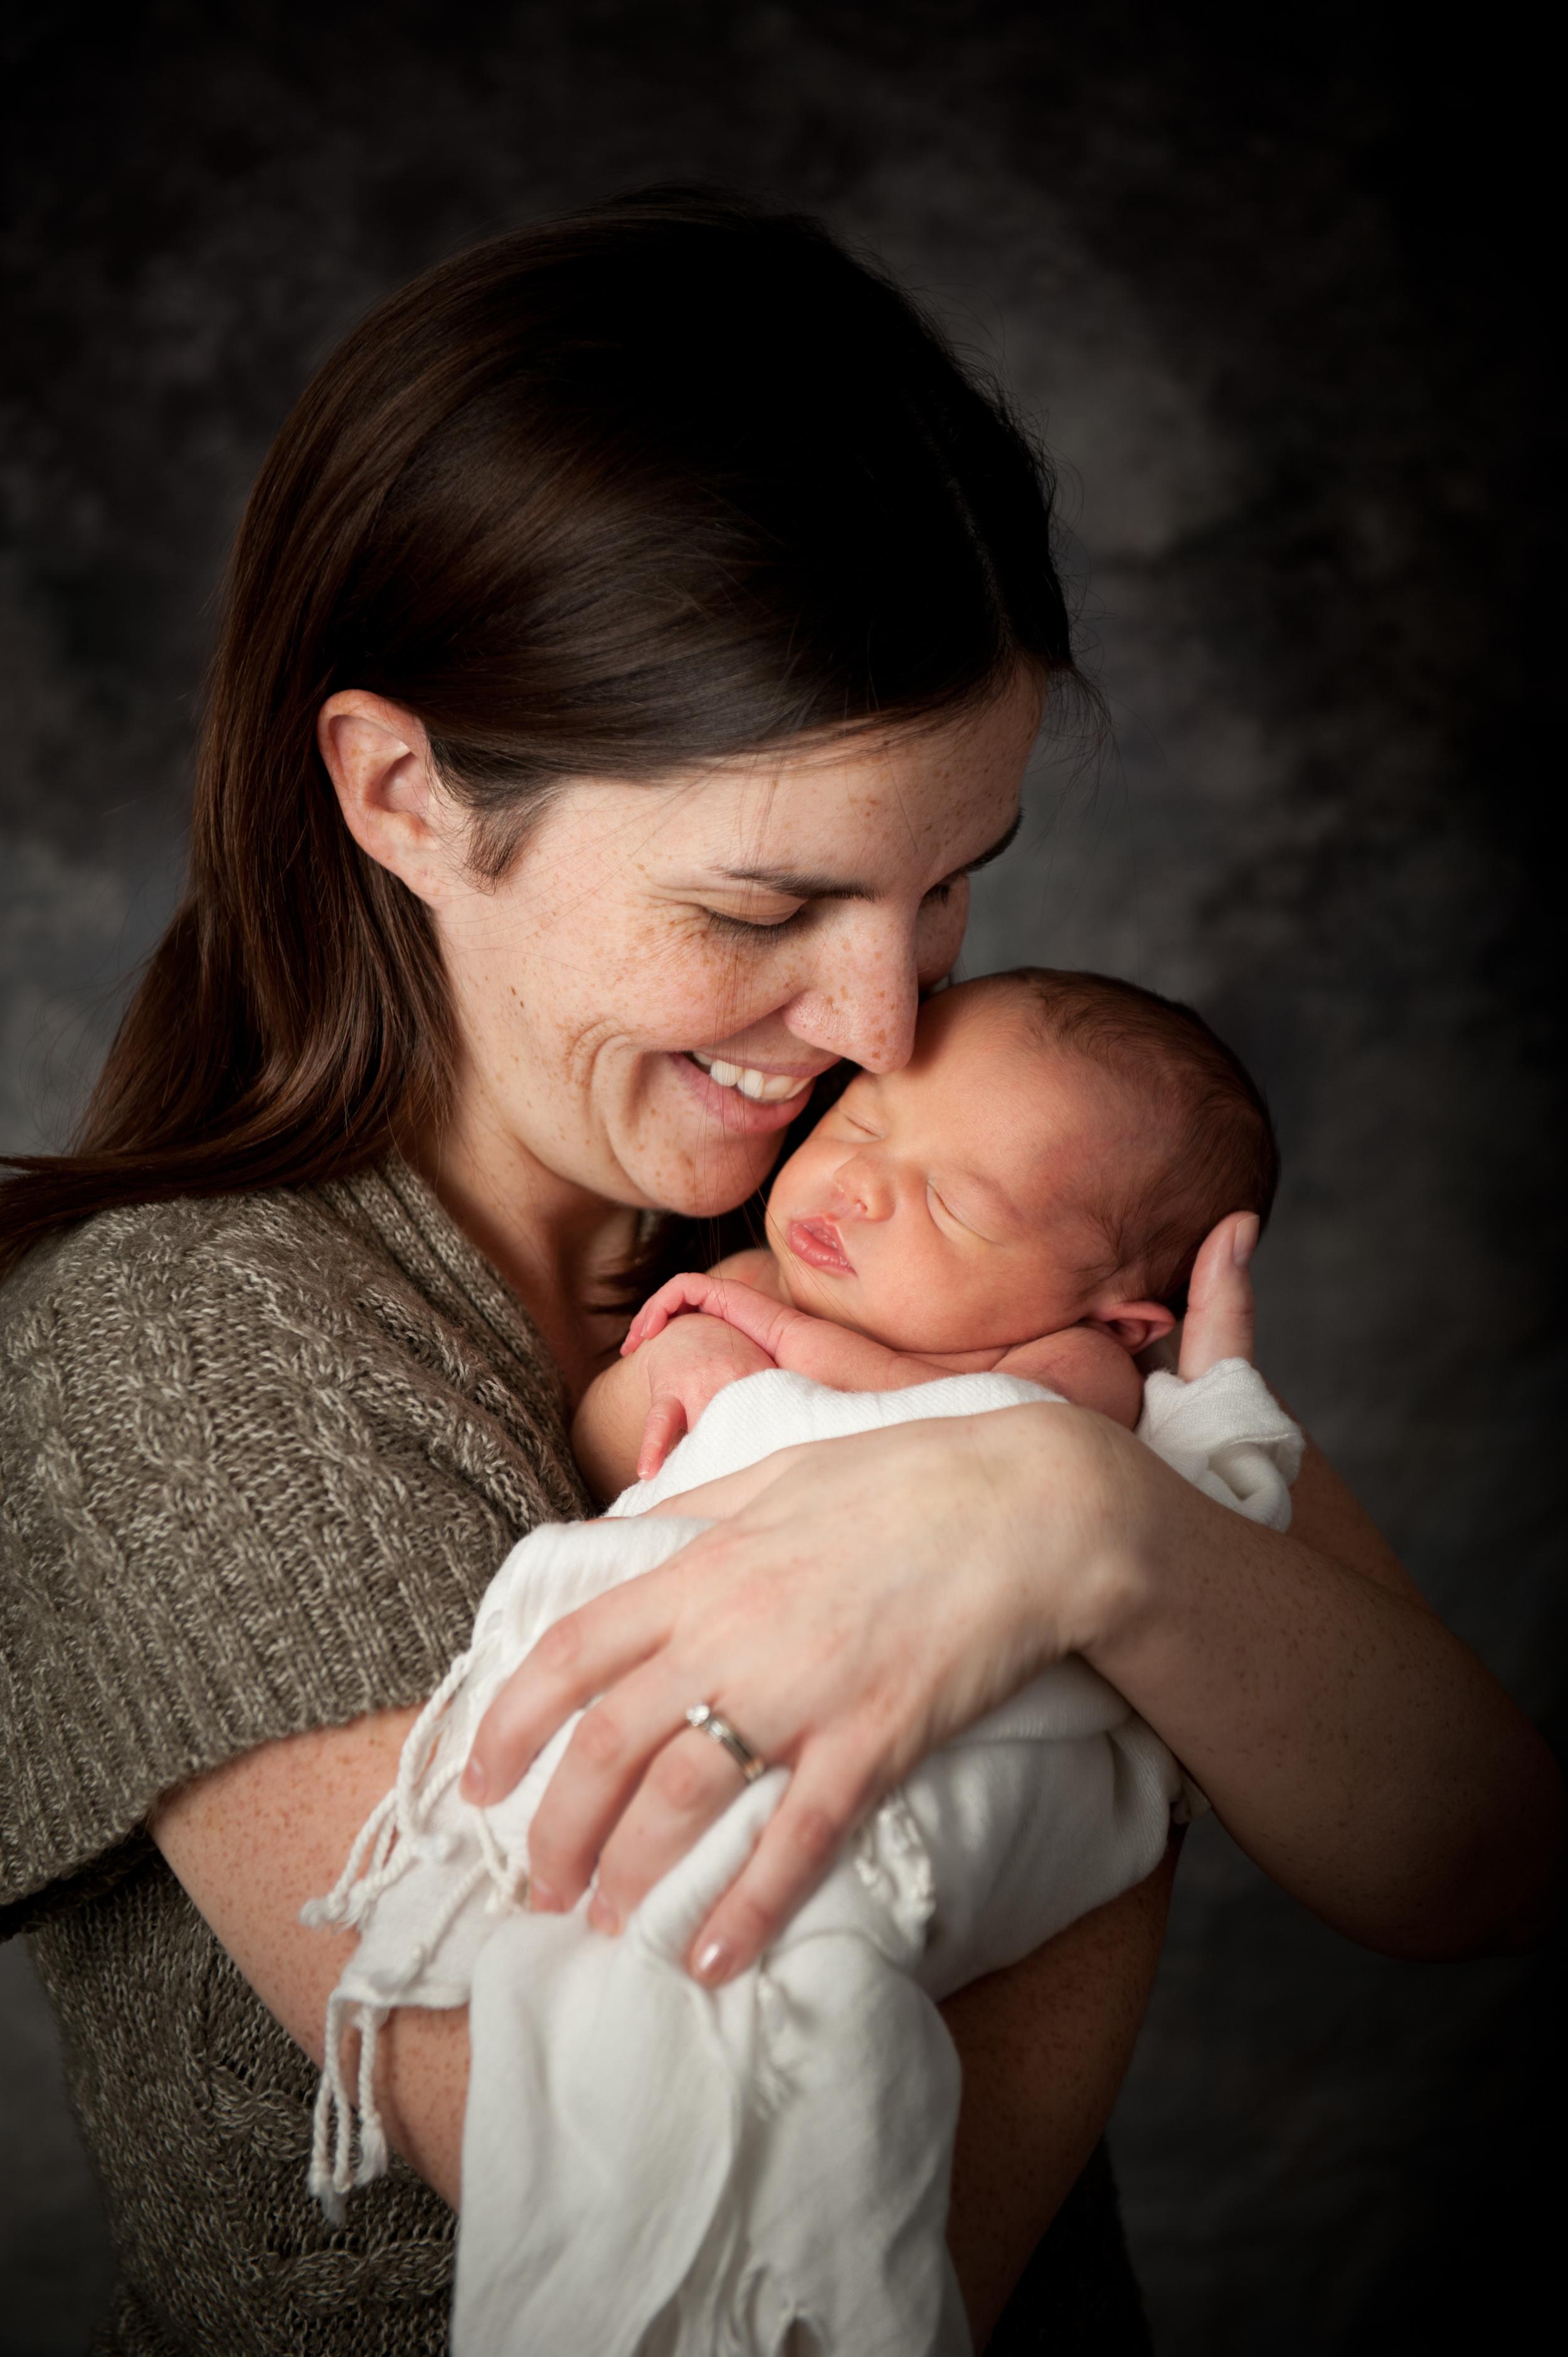 St. John's, Newfoundland Newborn Photographer